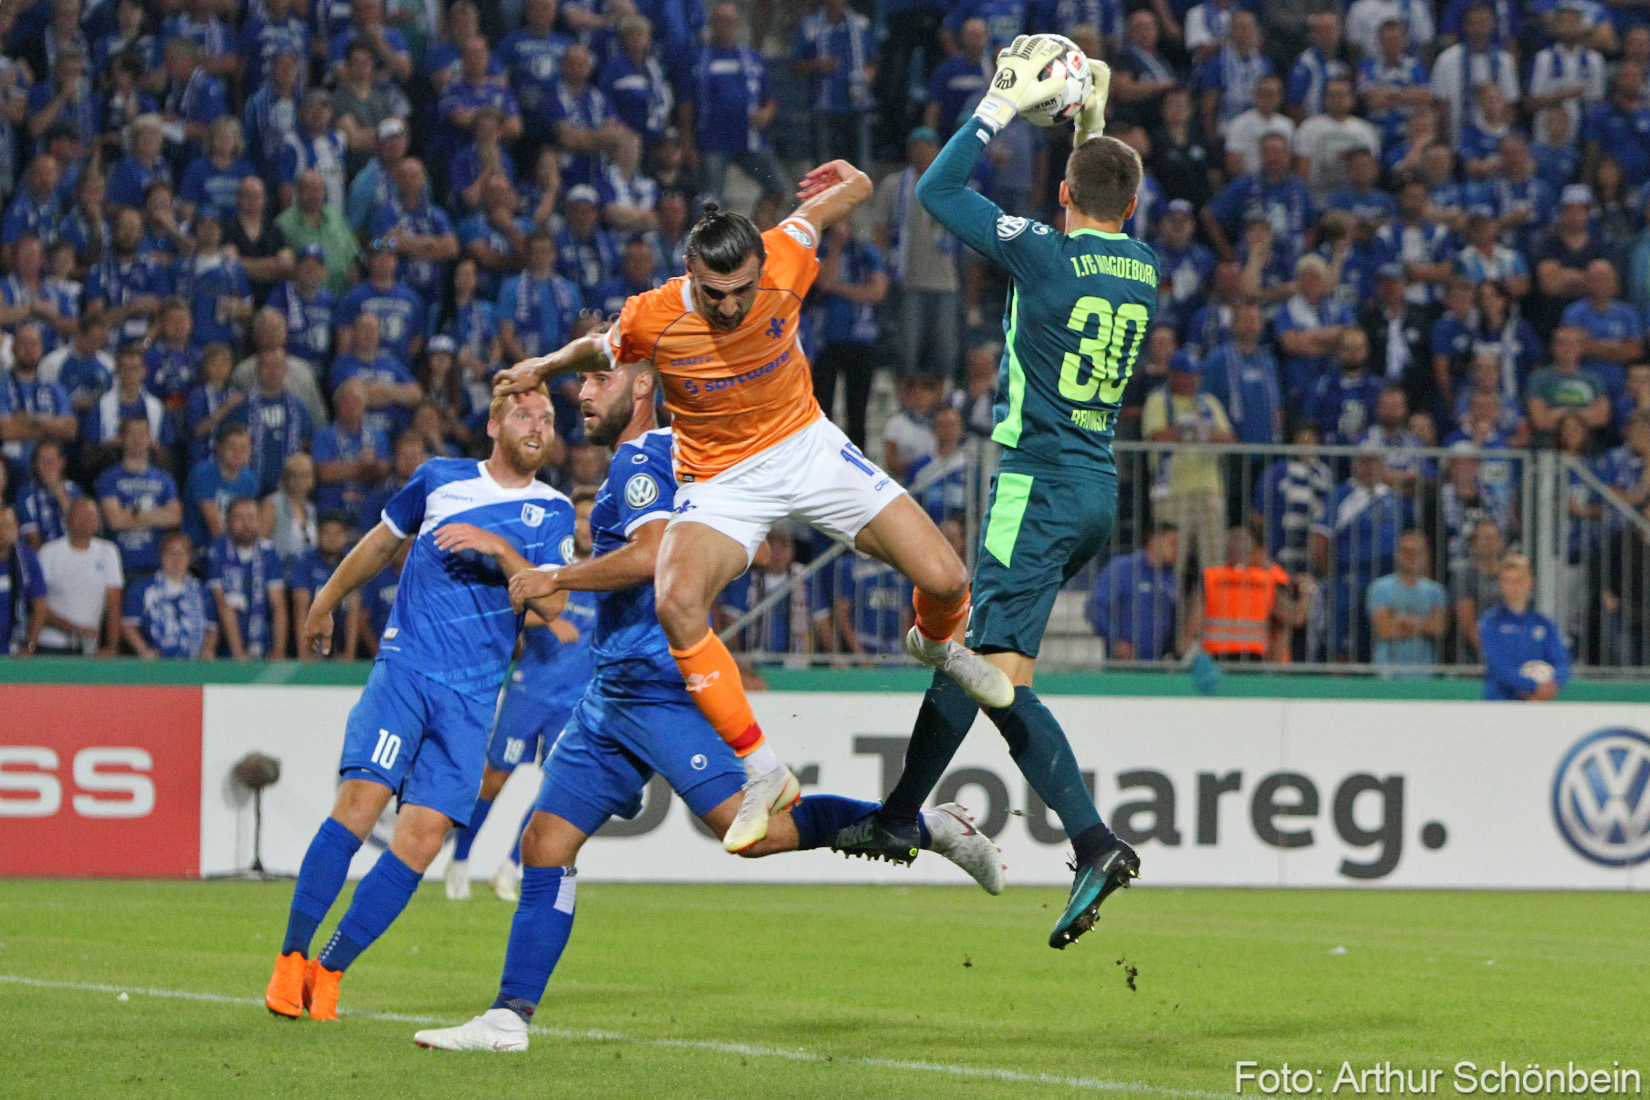 DFB-Pokal: 1. FC Magdeburg – SV Darmstadt 98 0:1 (0:1)